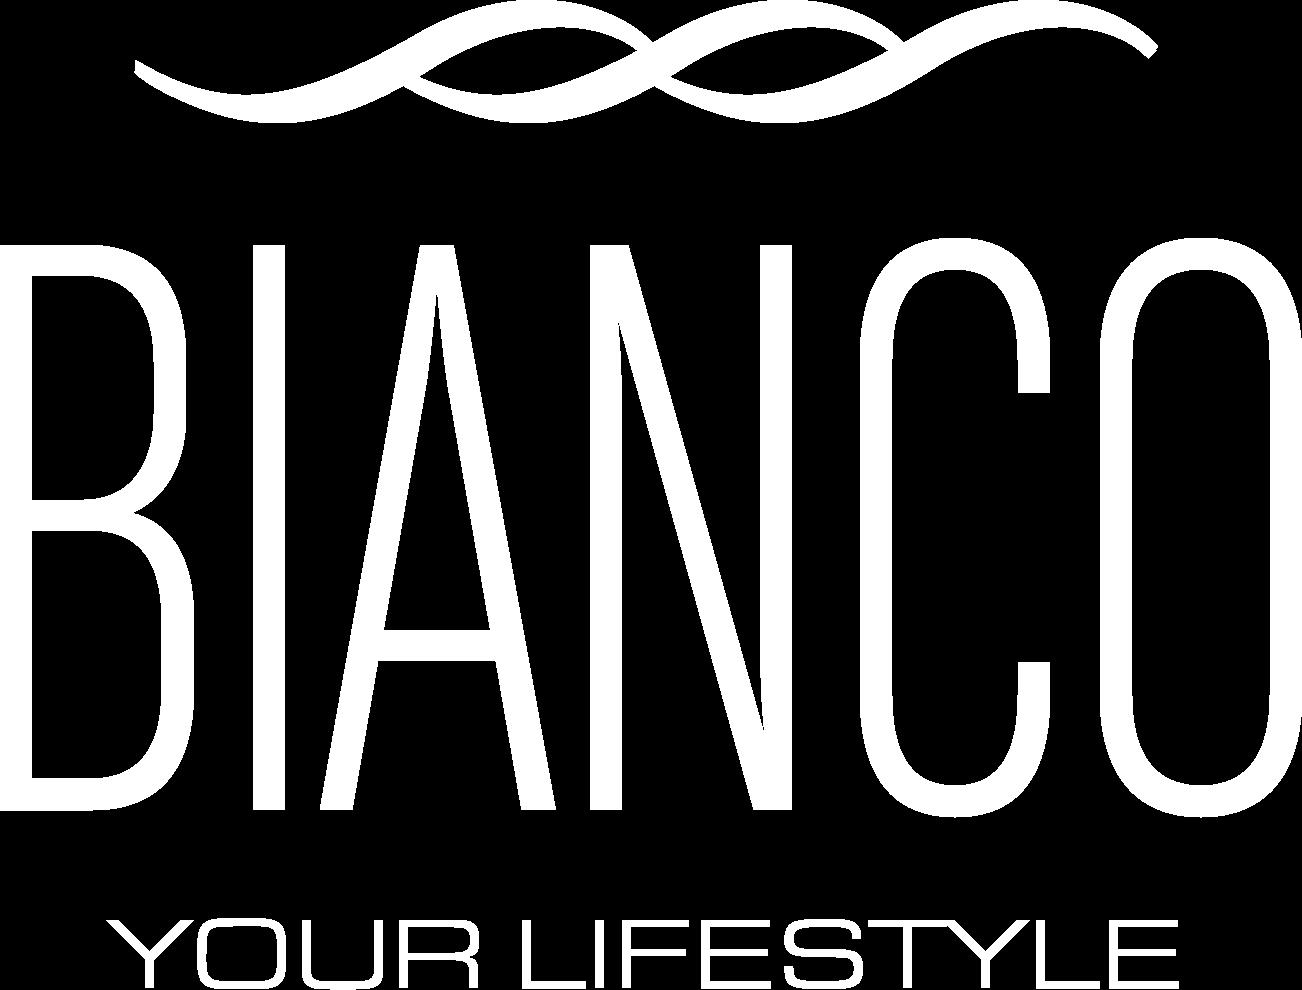 eBianco